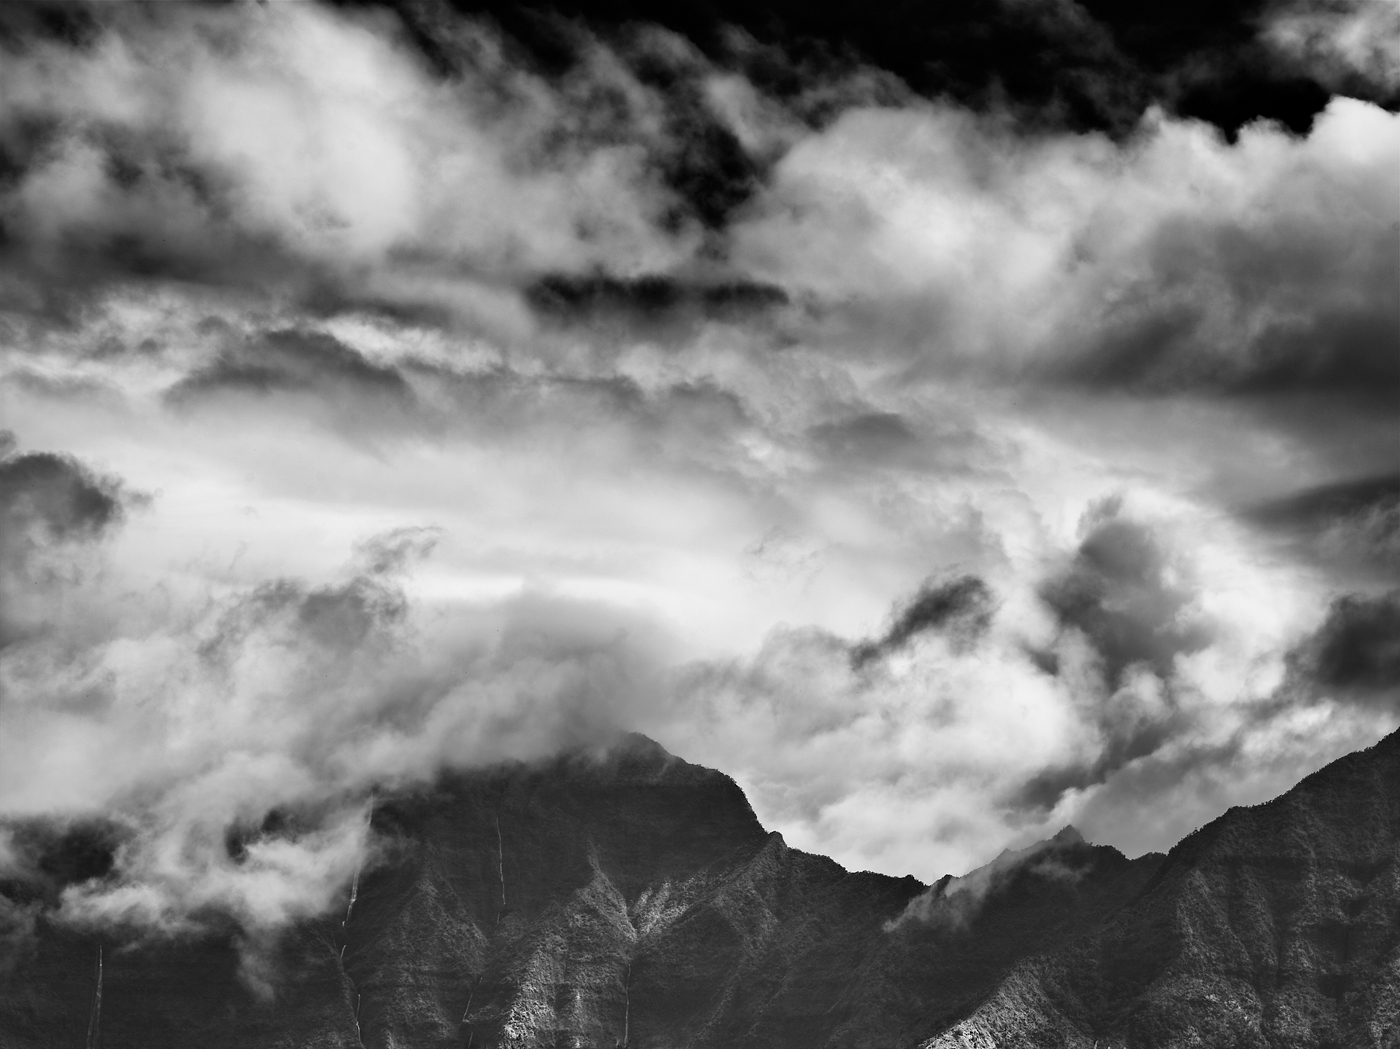 Cloud Falls by Peter Adams